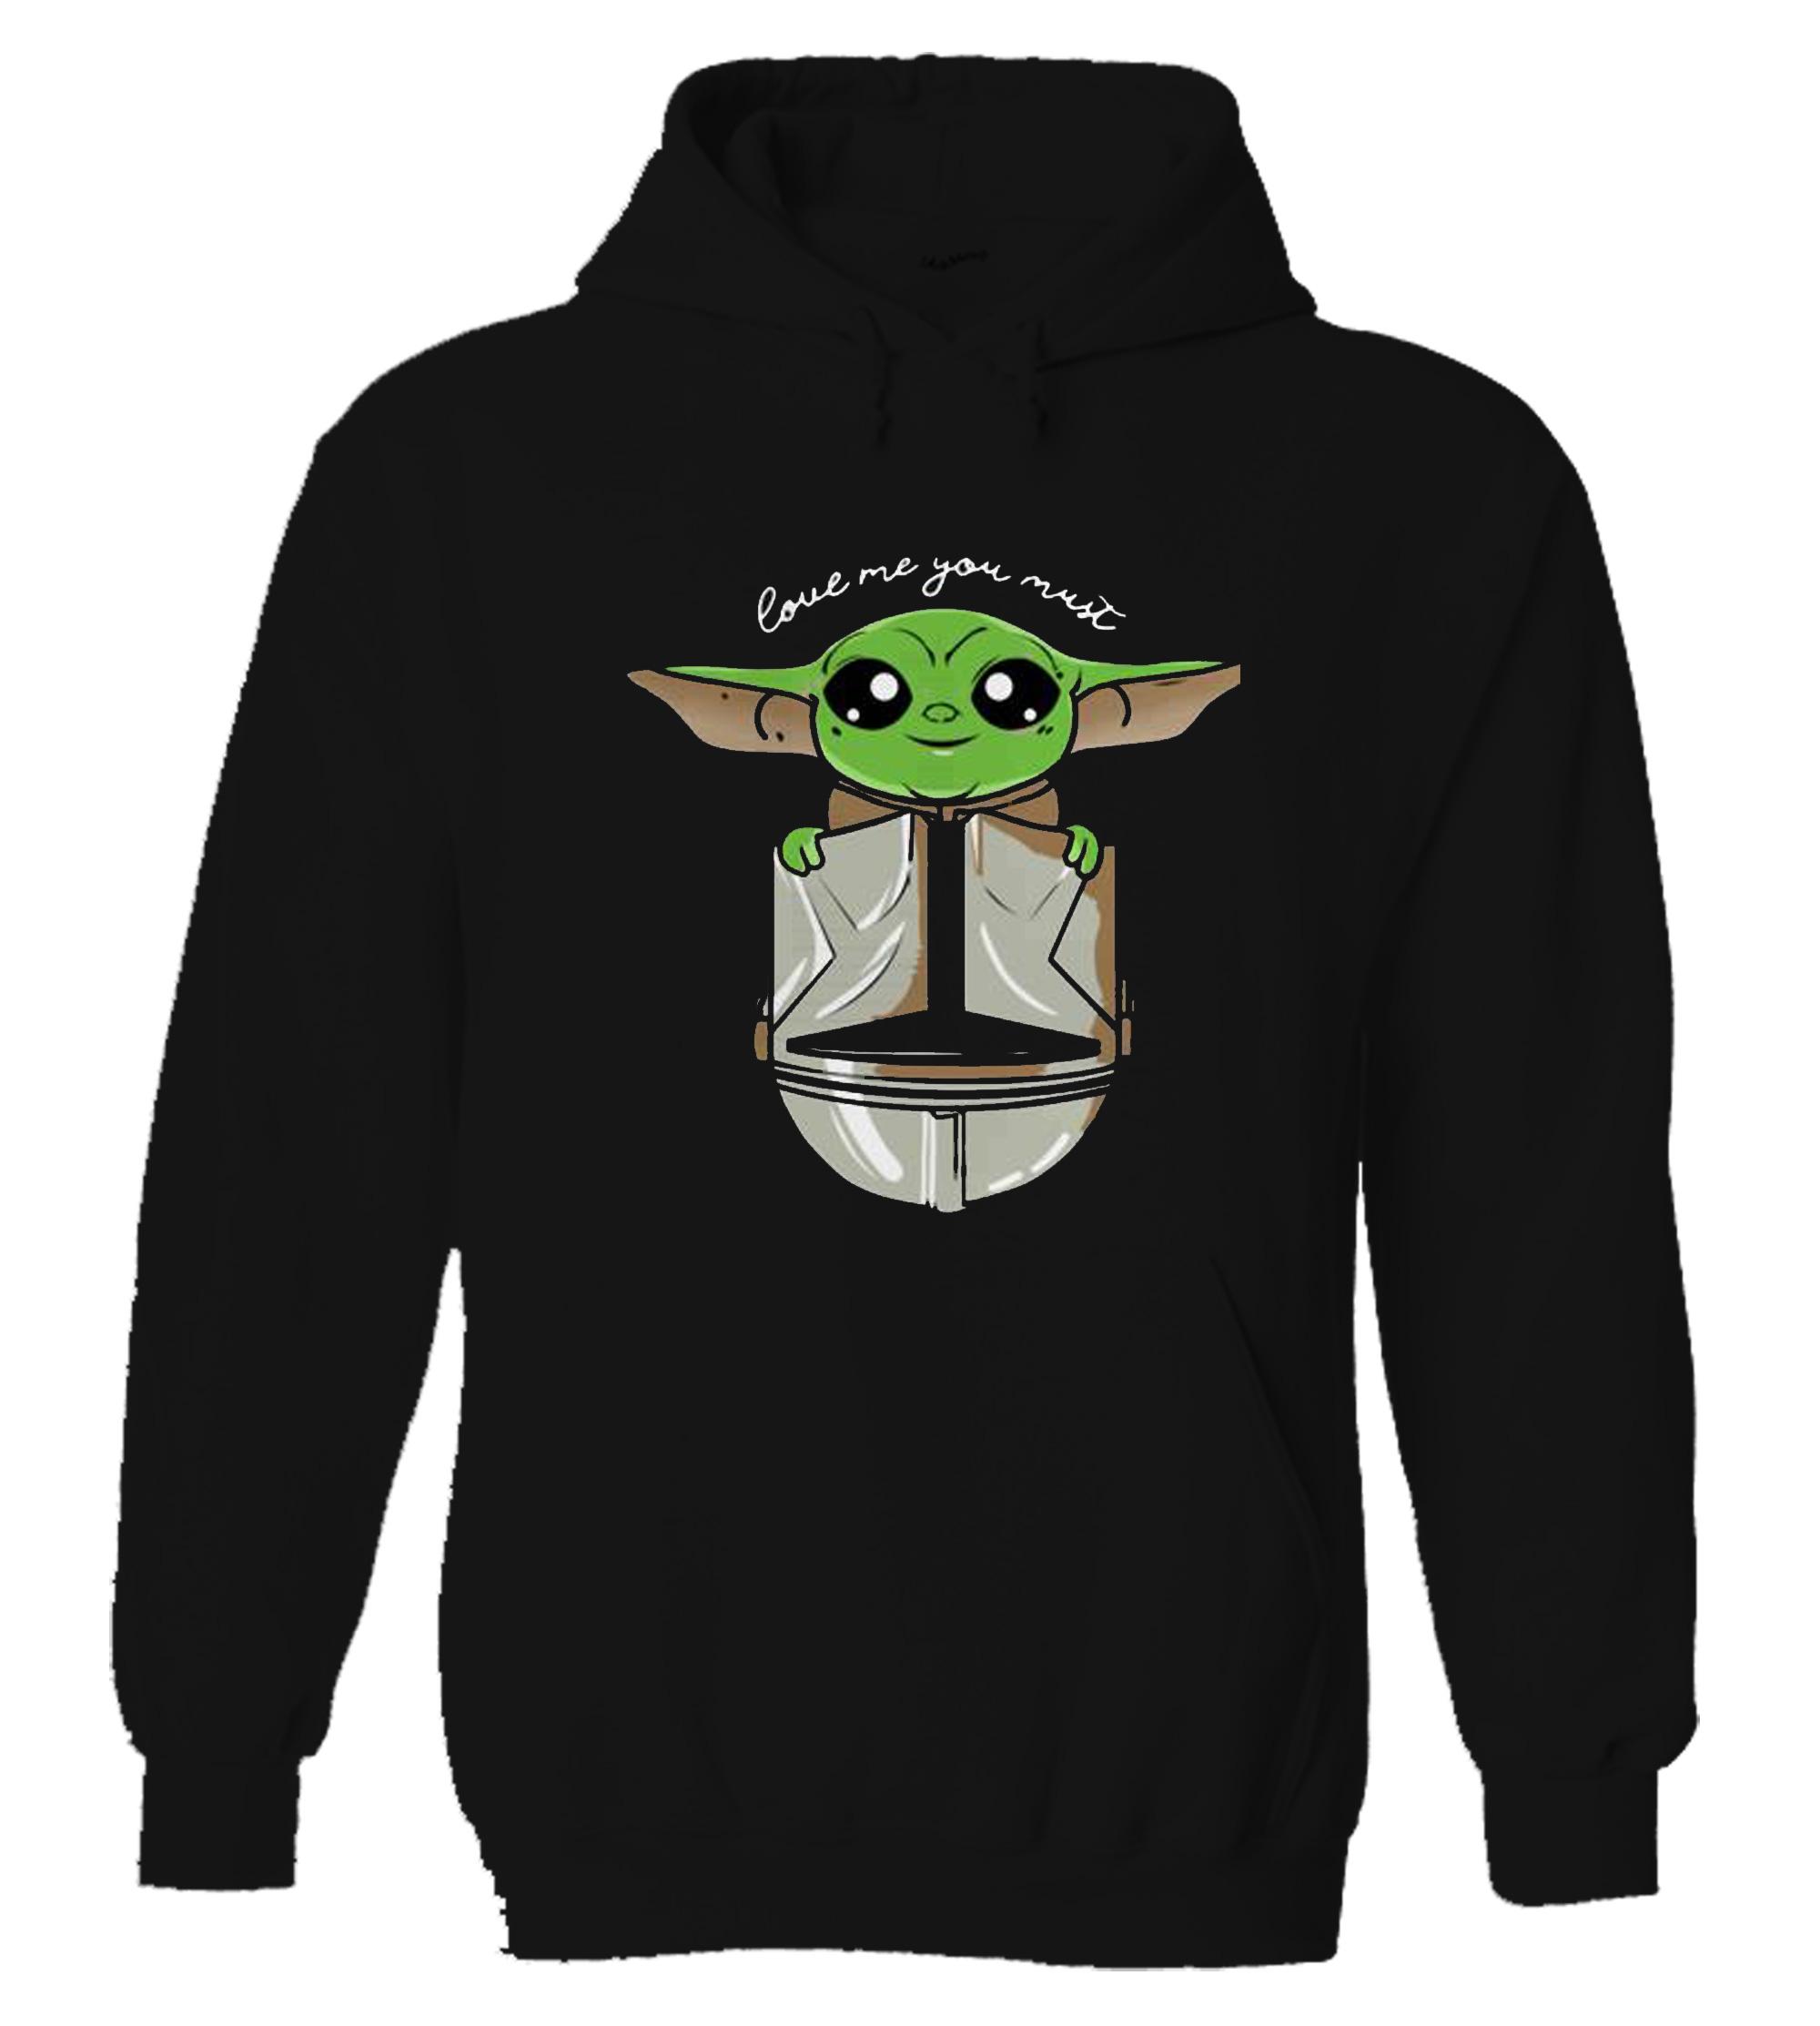 The Child little baby Yoda Mandalorian Hoodie